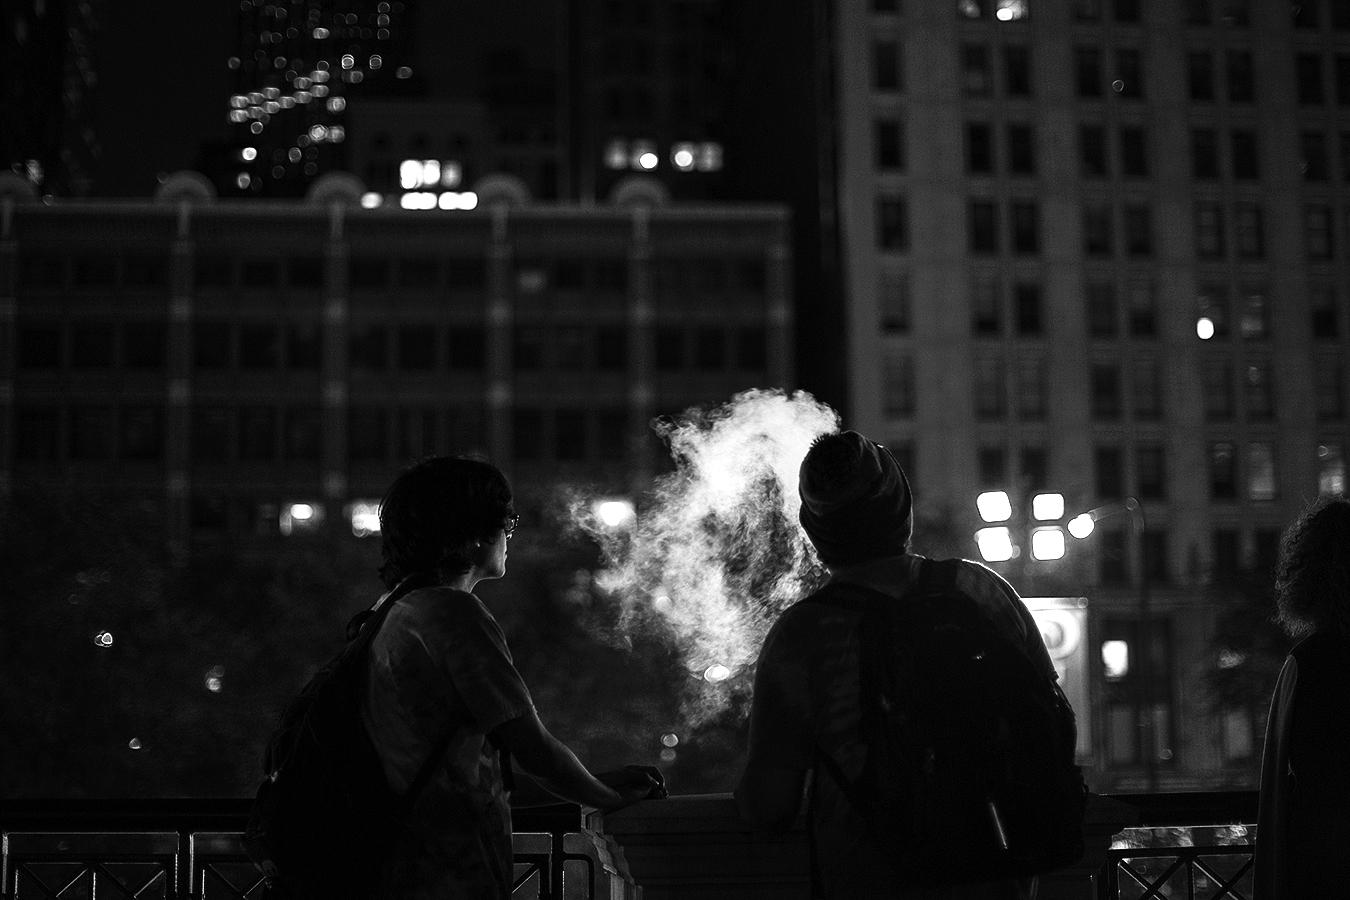 Linda_Ruan_smoking_at_night_silhouette_black_and_white_Chicago